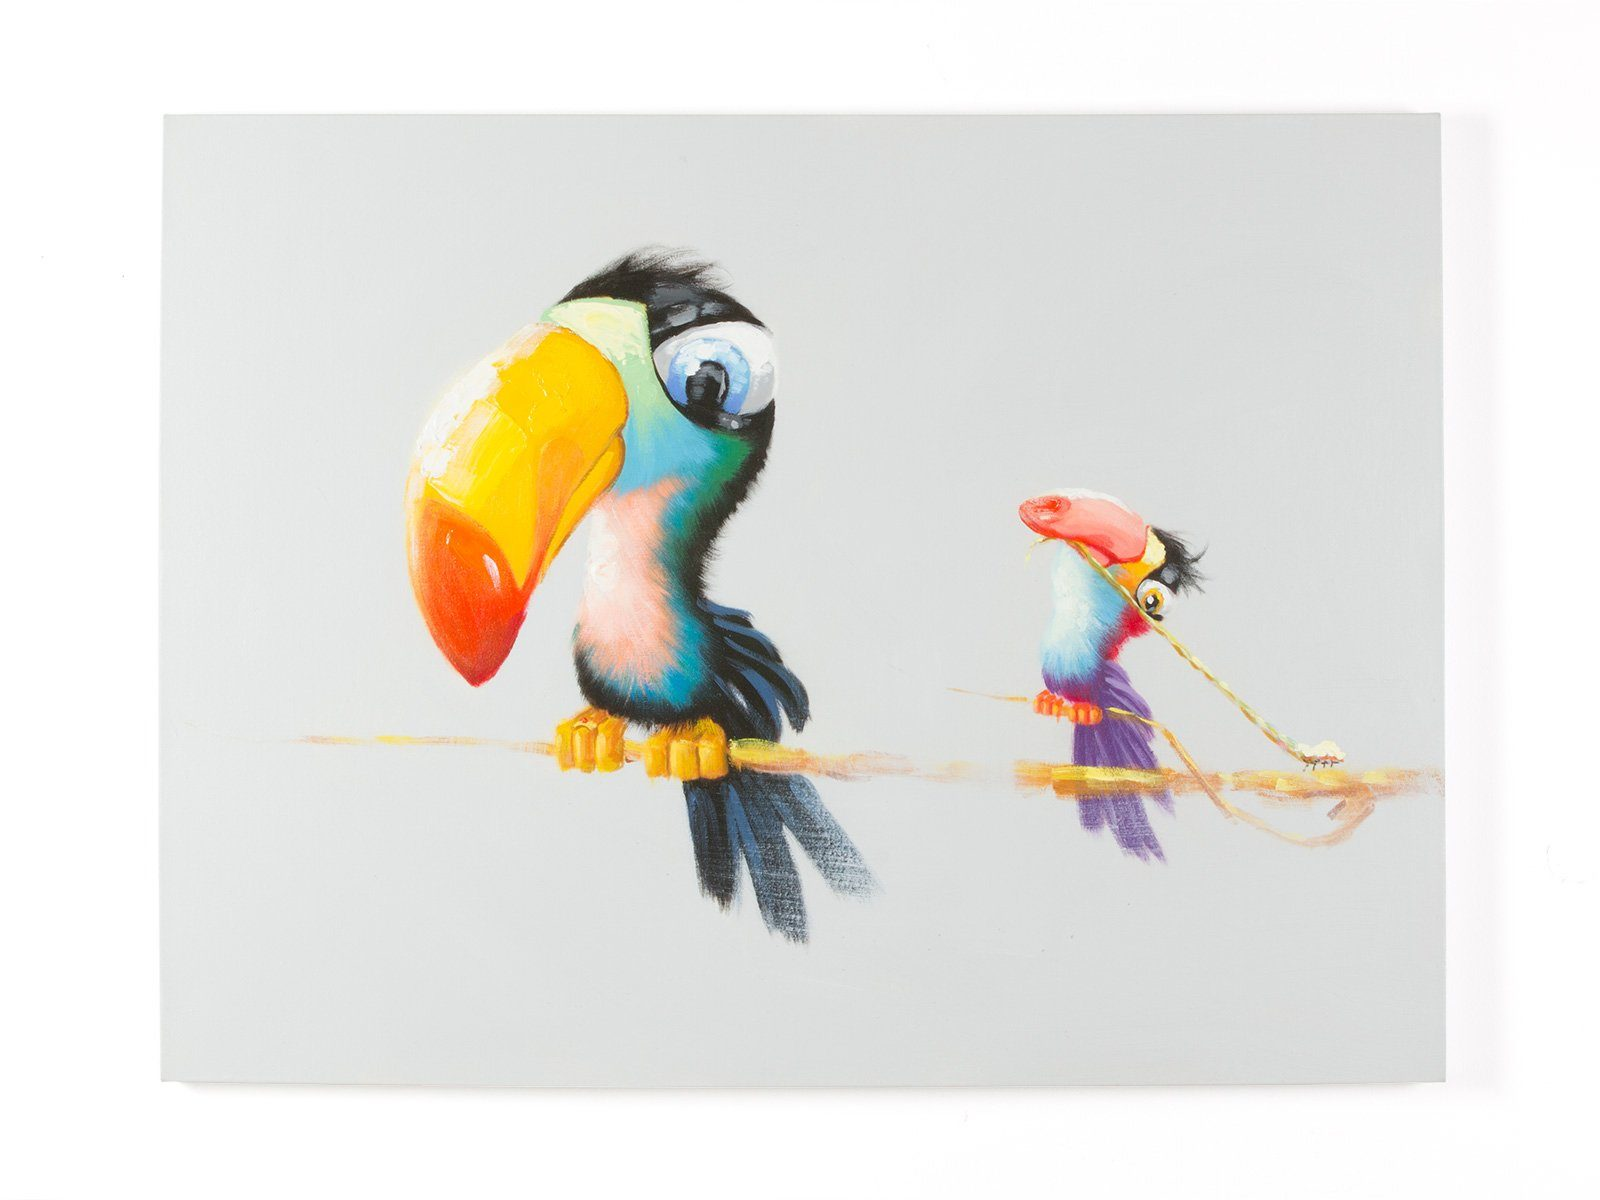 massivum Wandbild aus Stoff